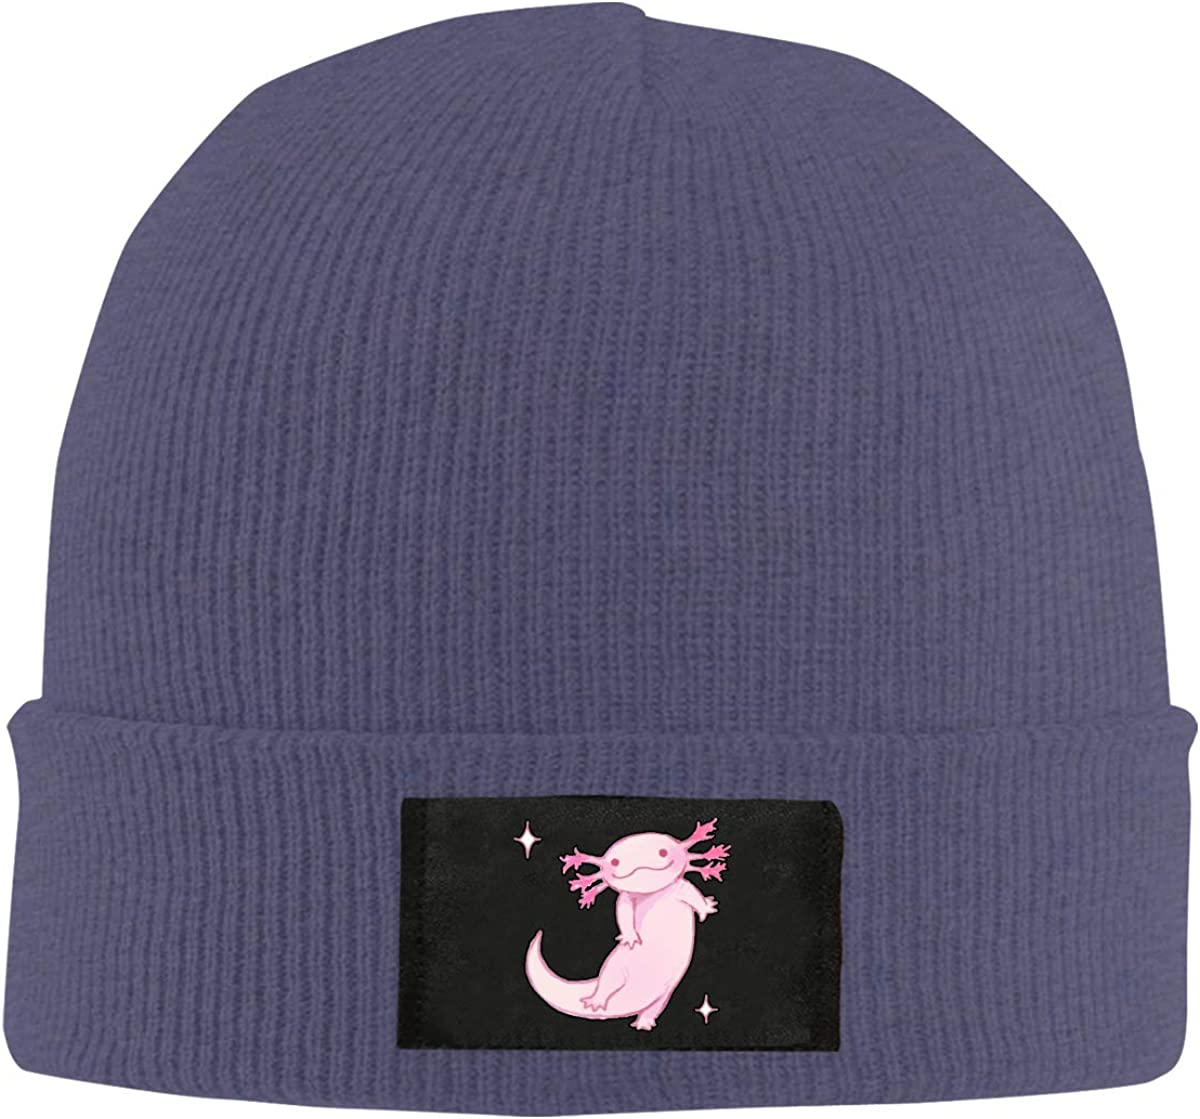 merahans Cartoon Pink Axolotl Unisex Today's only sale Casual Beanie Skull Cap